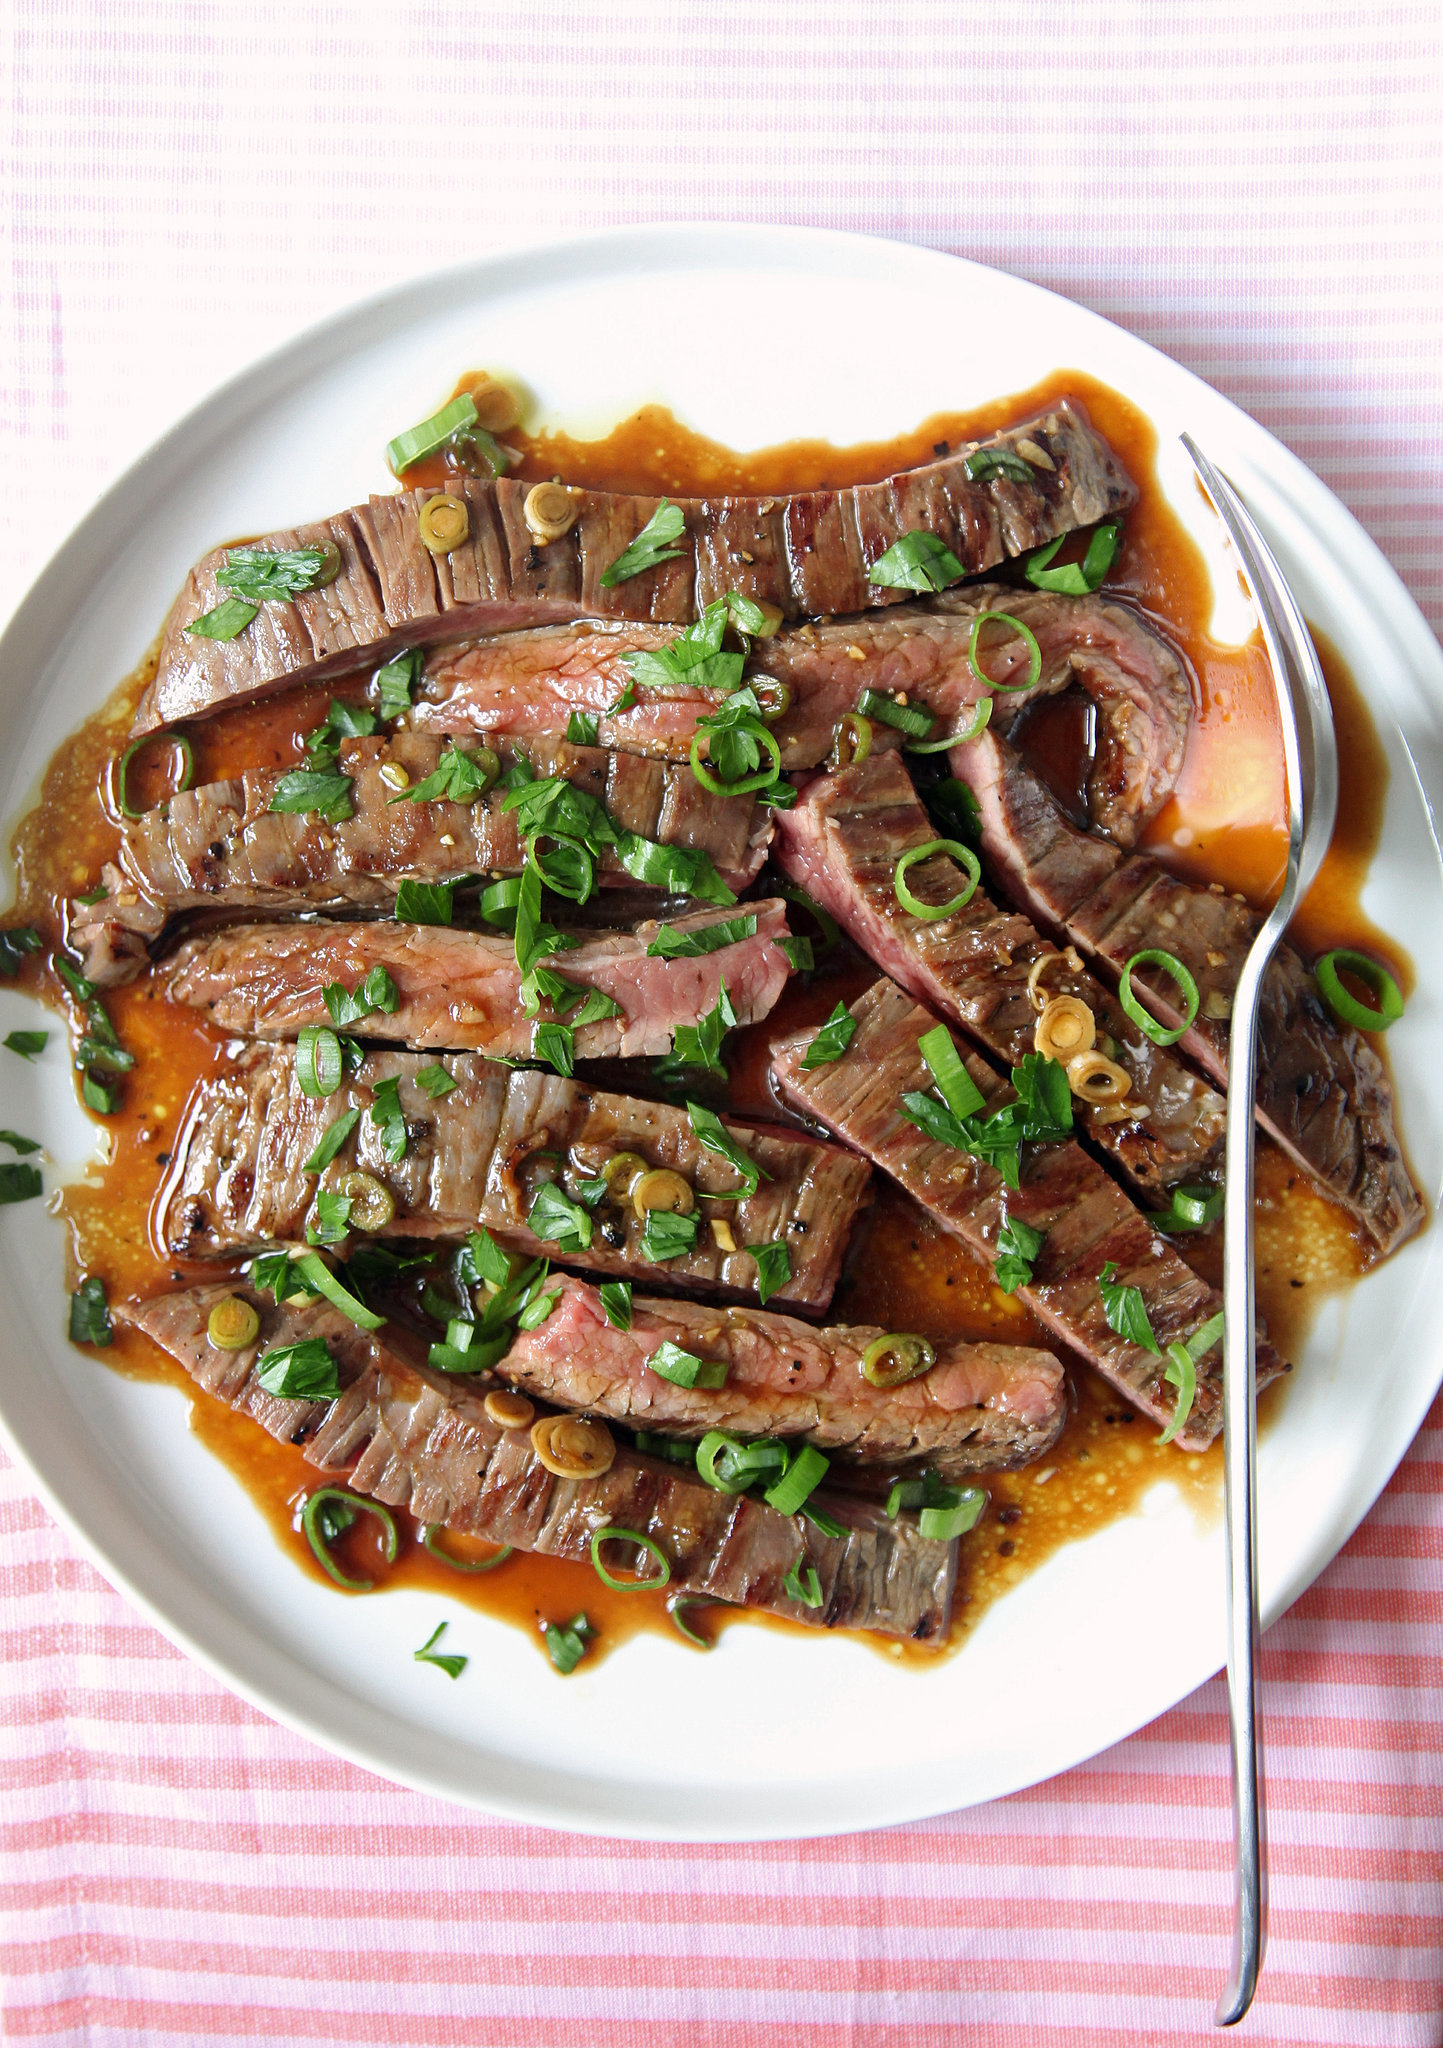 Easy Grilled Marinated Skirt Steak Recipe | POPSUGAR Food